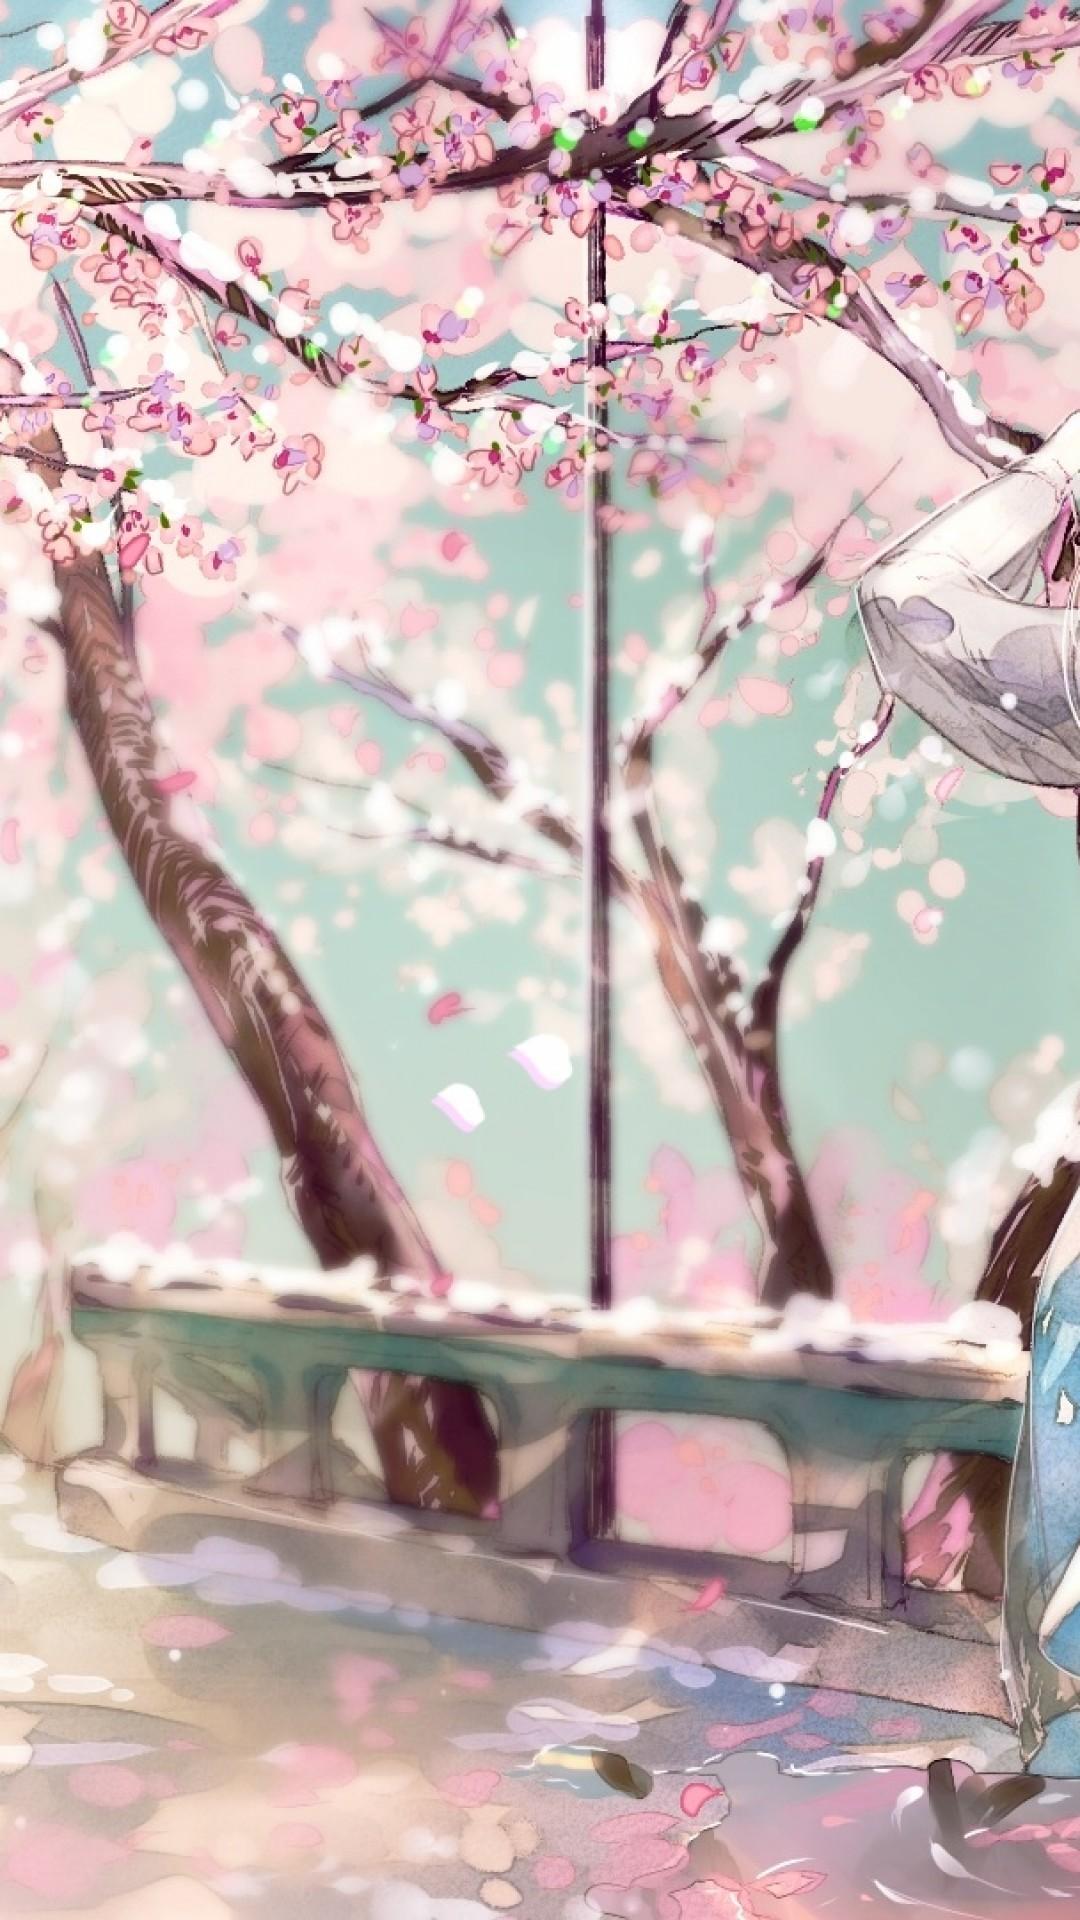 Cherry Blossom Sakura Anime Girl Back View Cherry Blossom Sakura Wallpaper Iphone 1080x1920 Wallpaper Teahub Io